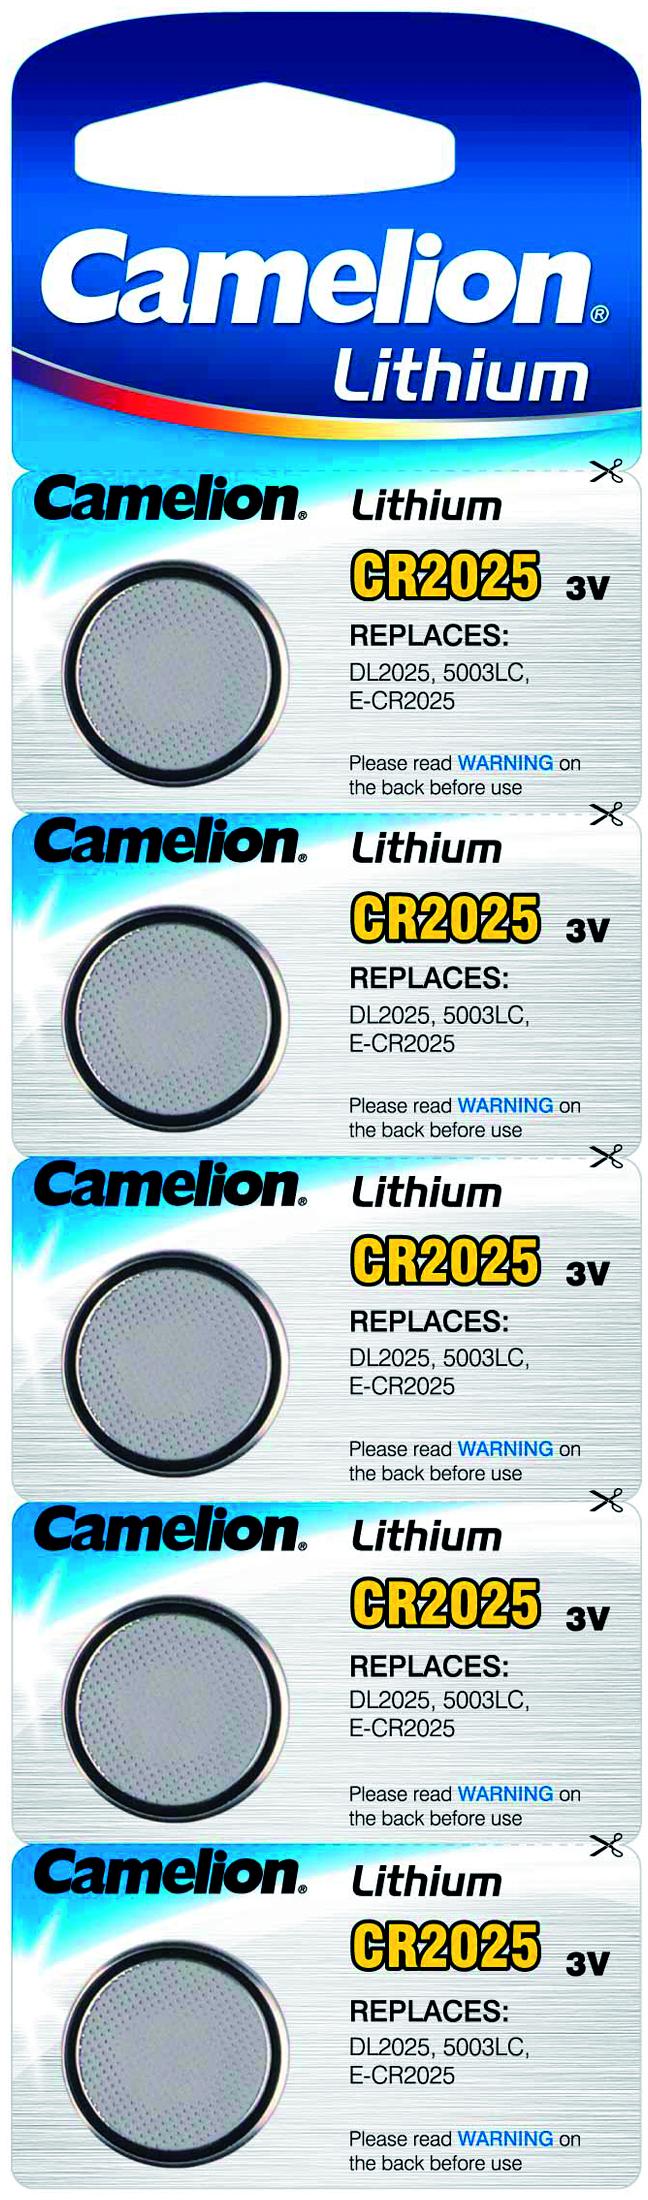 Camelion CR2025 5x